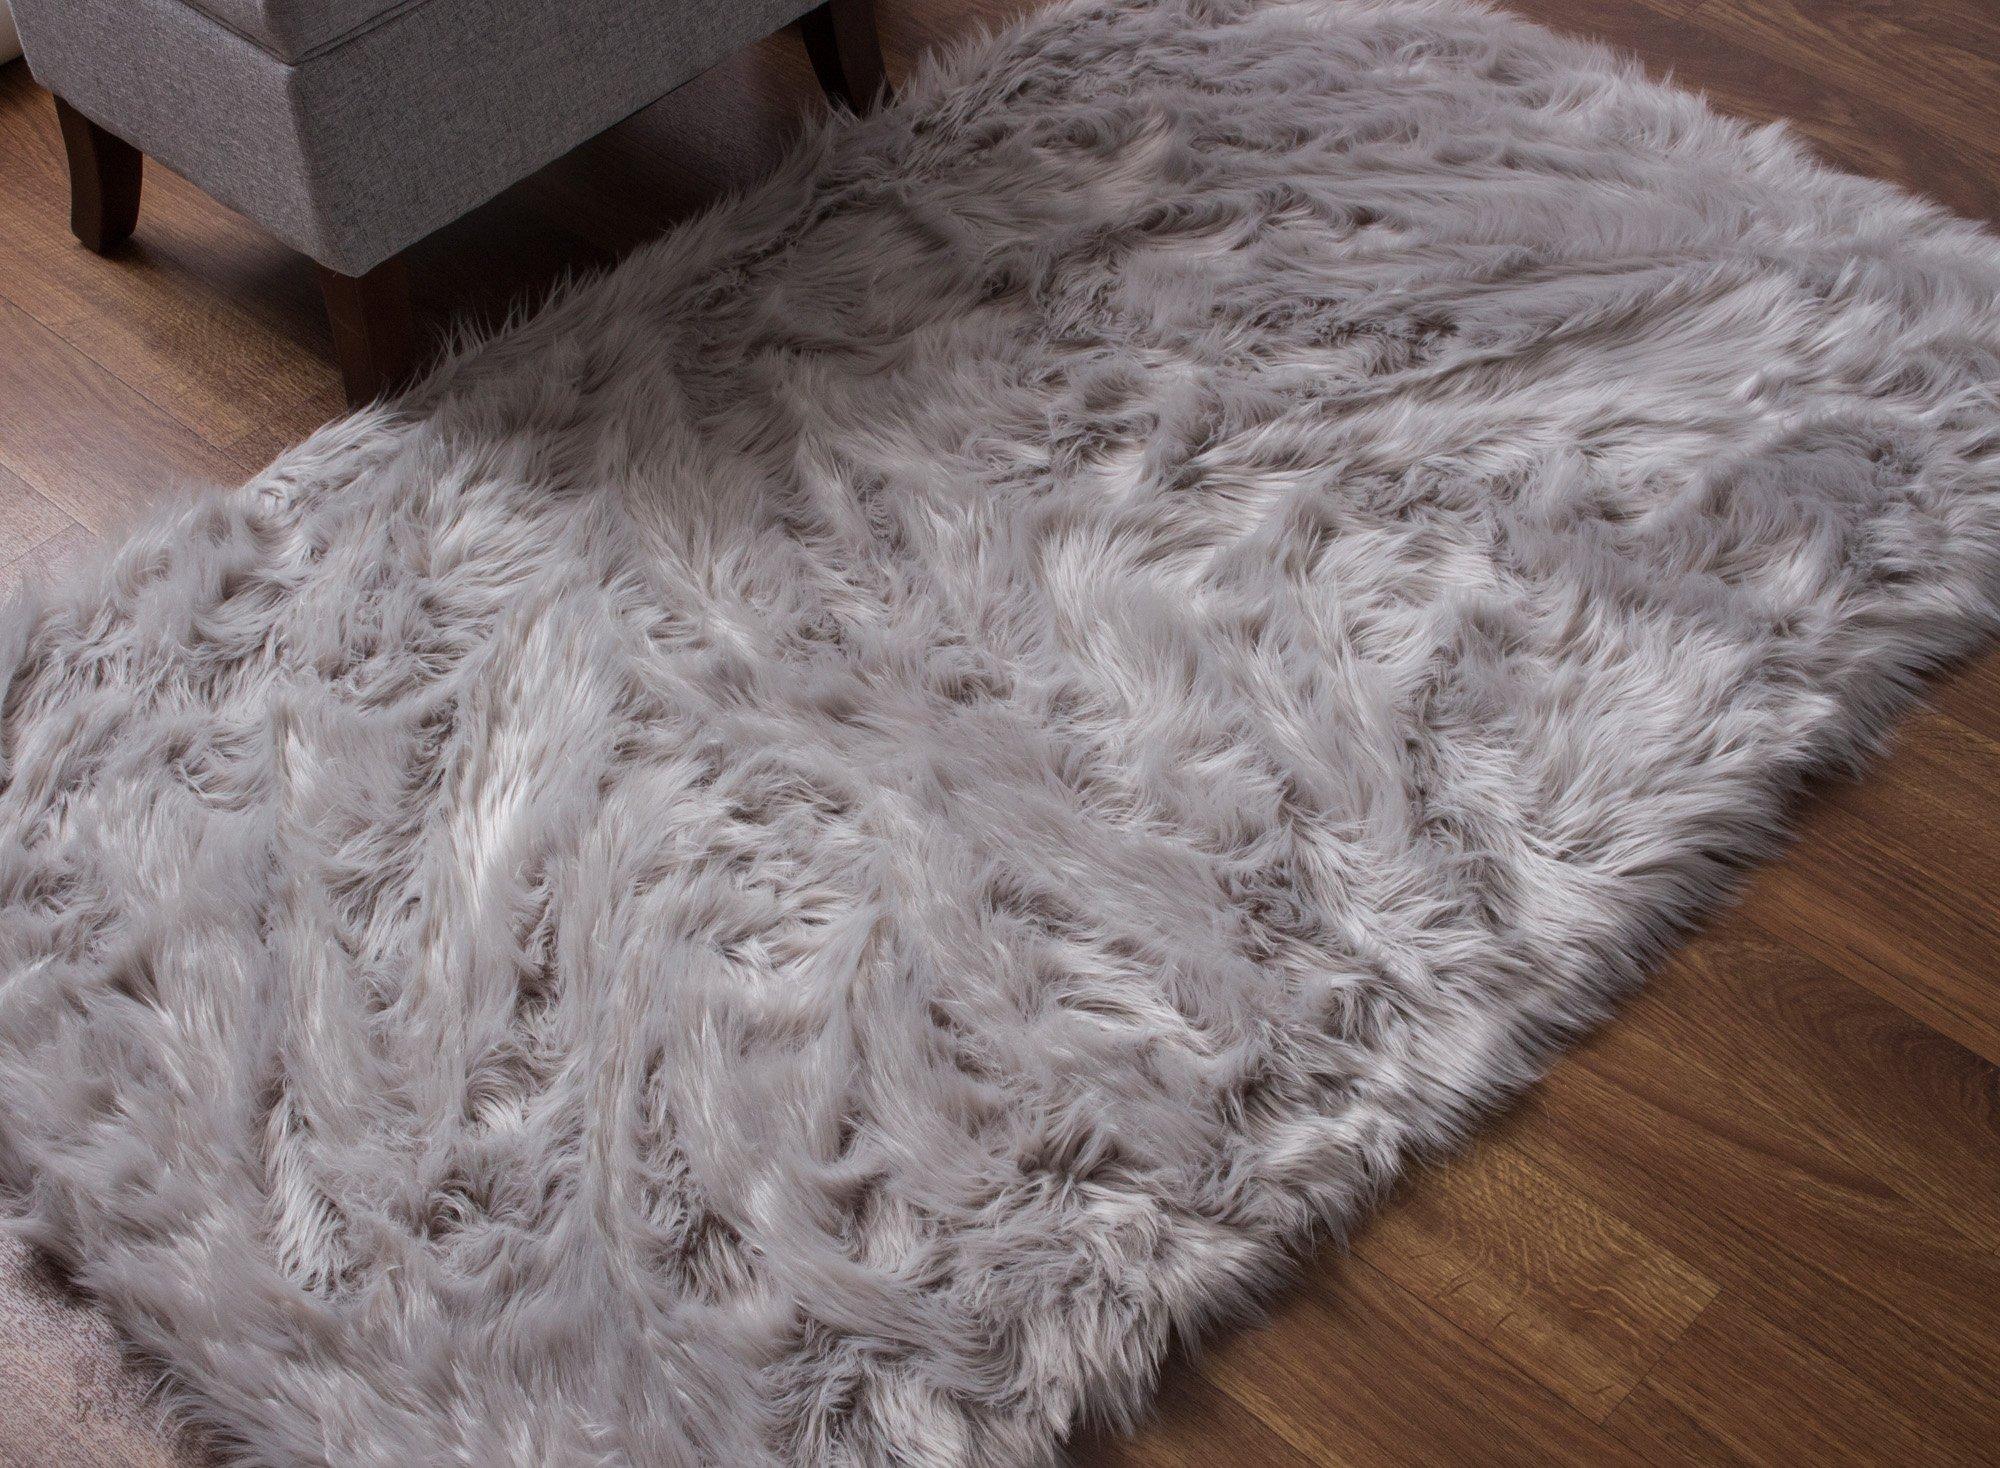 Serene Super Soft Faux Sheepskin Shag Silky Rug Baby Nursery Childrens Room Rug Gray, 5' x 7'